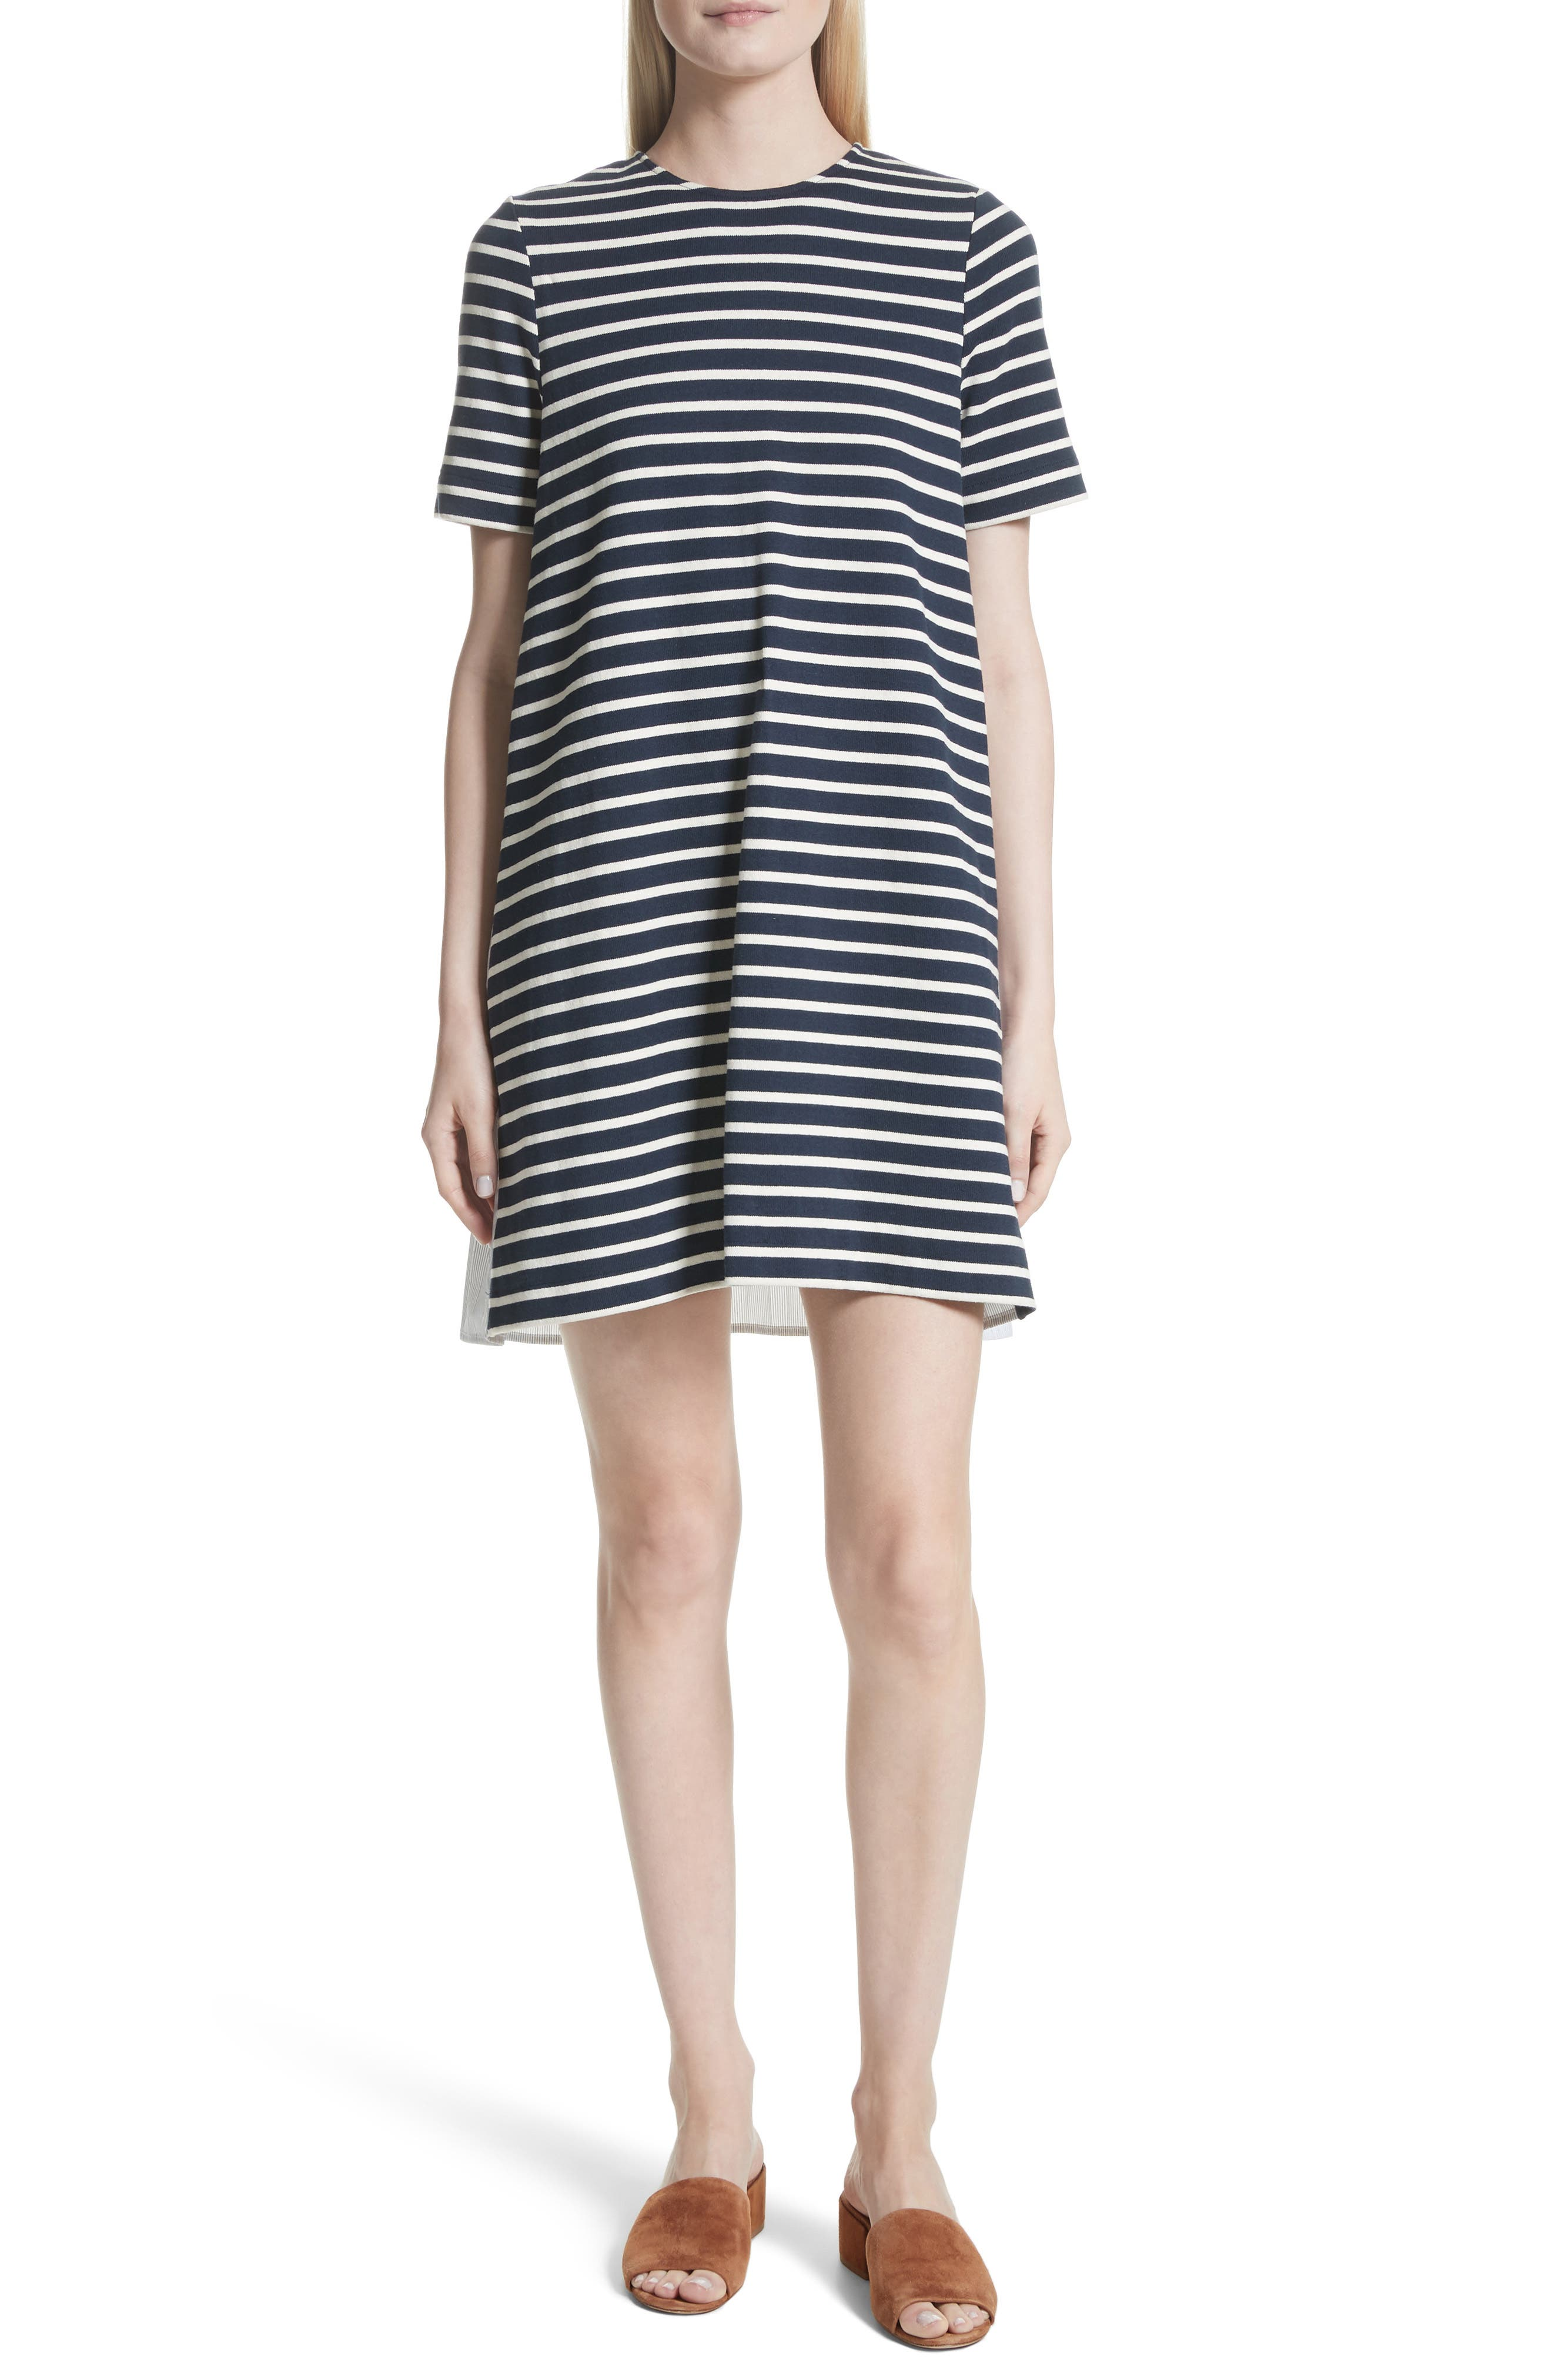 Latch Back Tunic Dress,                         Main,                         color, Navy/ Cream Multi